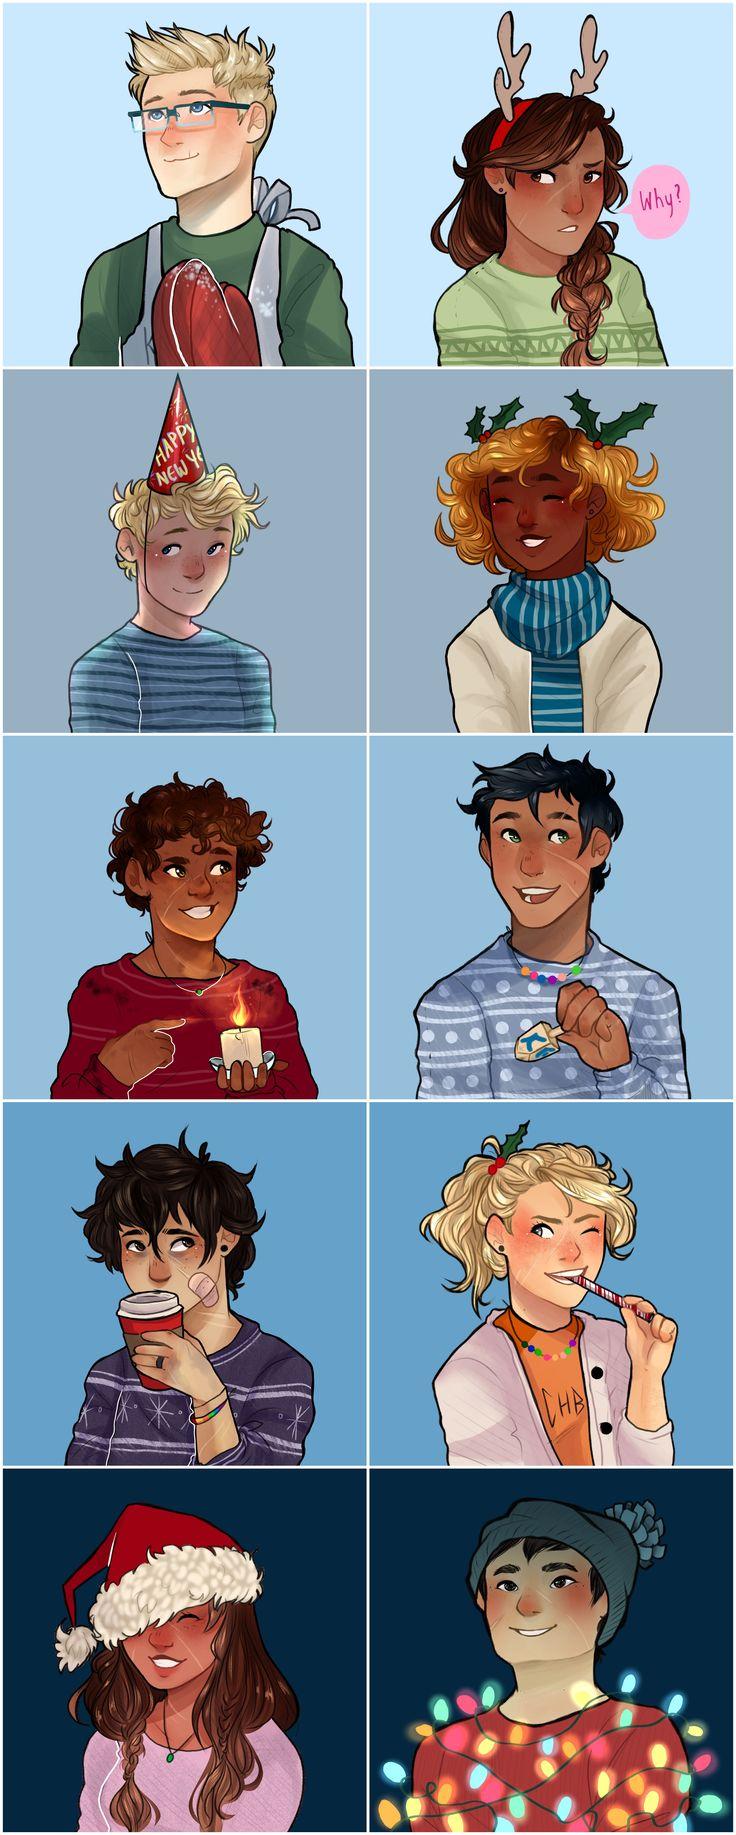 Holiday icons!!! from top to bottom: Jason, Reyna, Will, Hazel, Leo, Percy, Nico, Annabeth, Piper and Frank